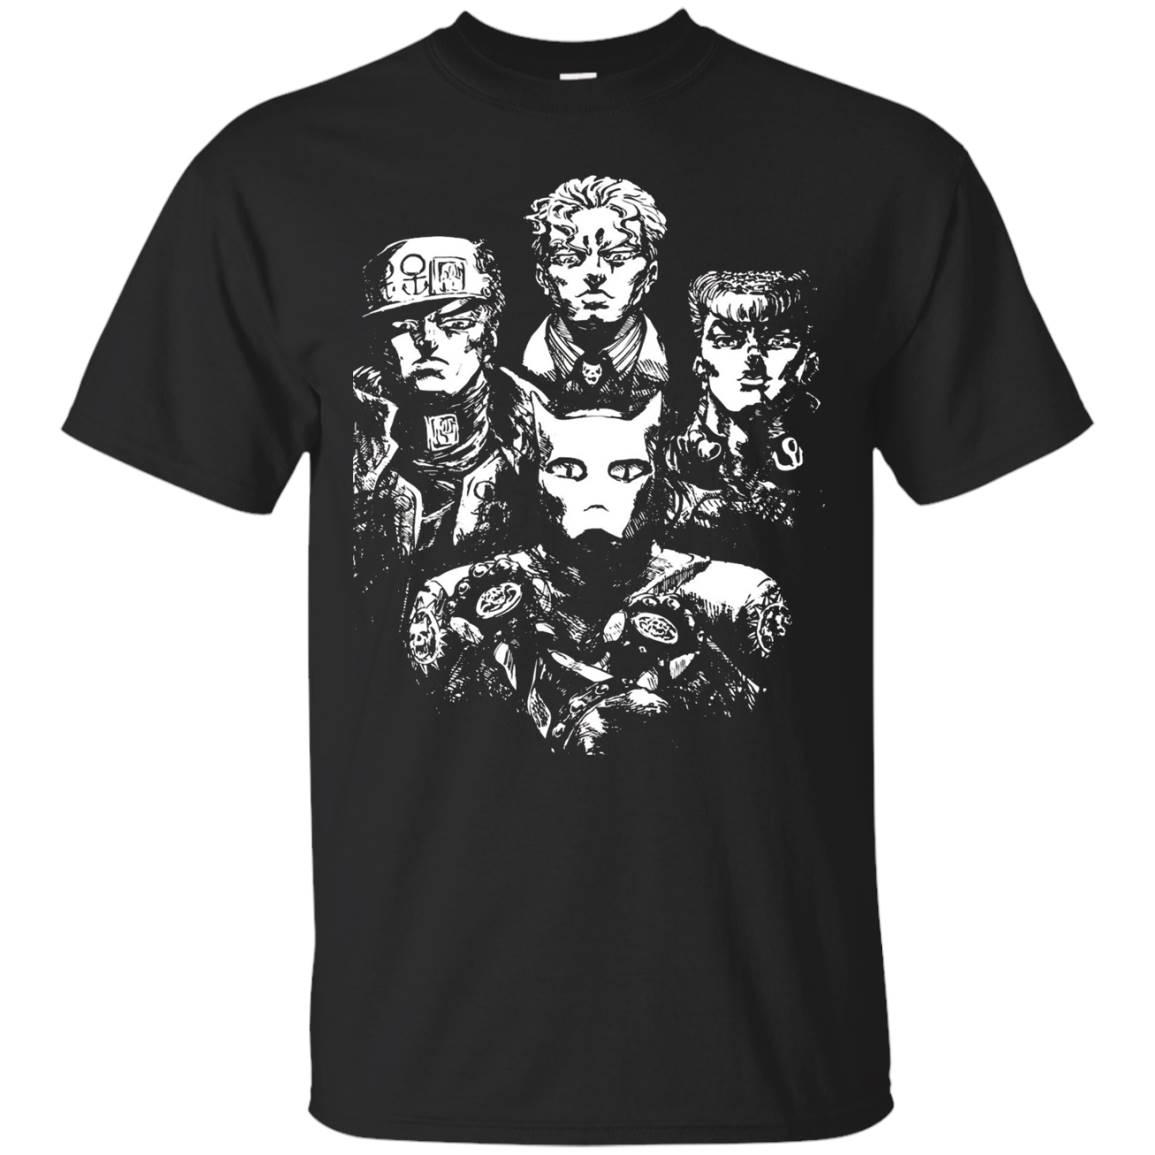 Jojo's Bizarre Adventure Funny T-Shirt